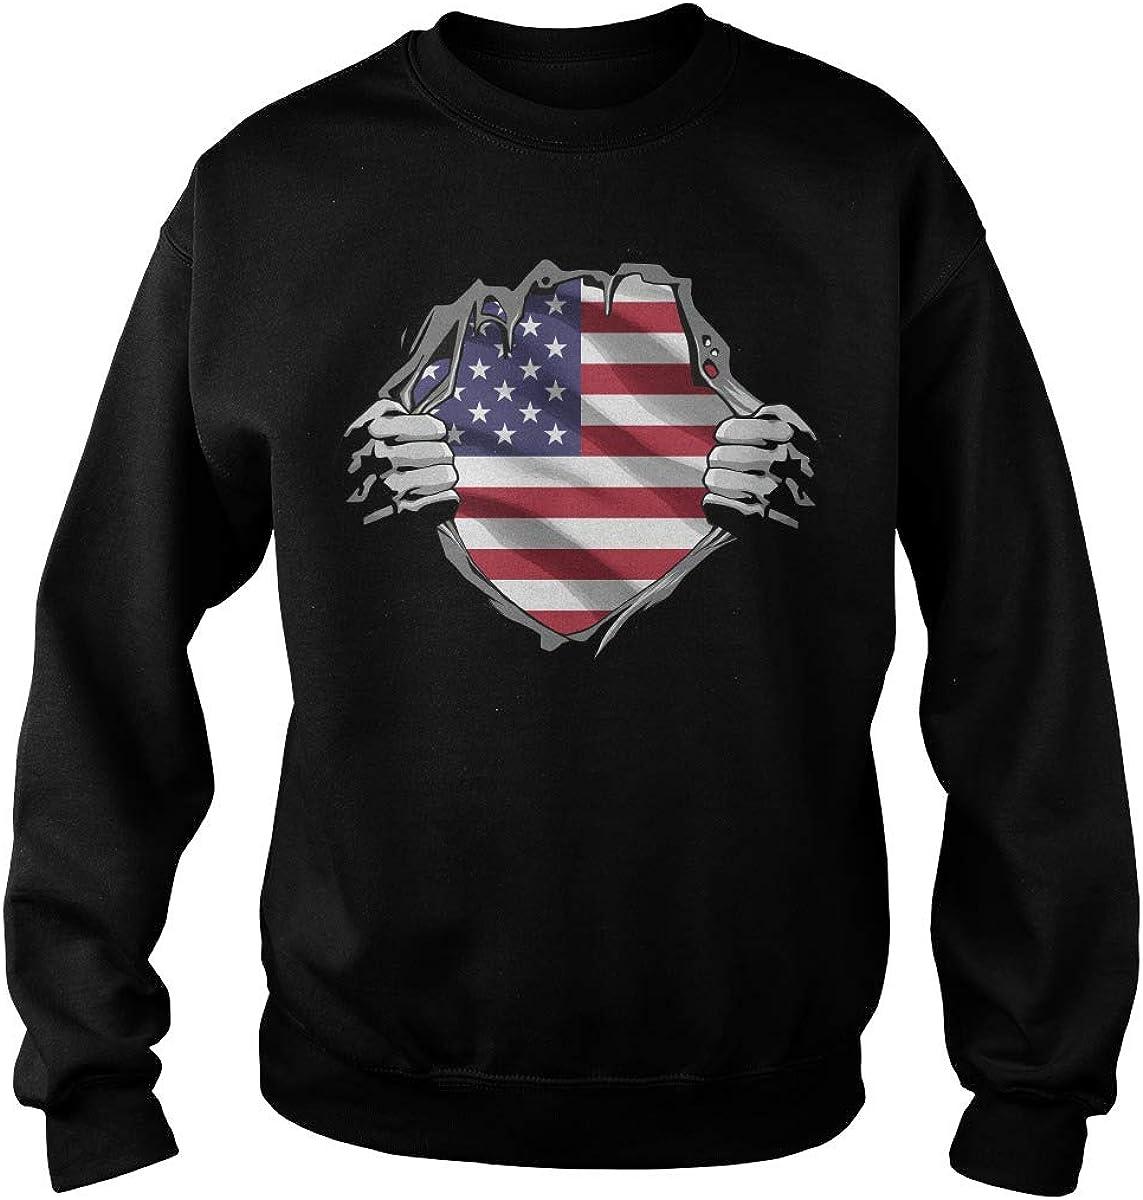 Poogky American Superheroes Adult Crewneck Sweatshirt